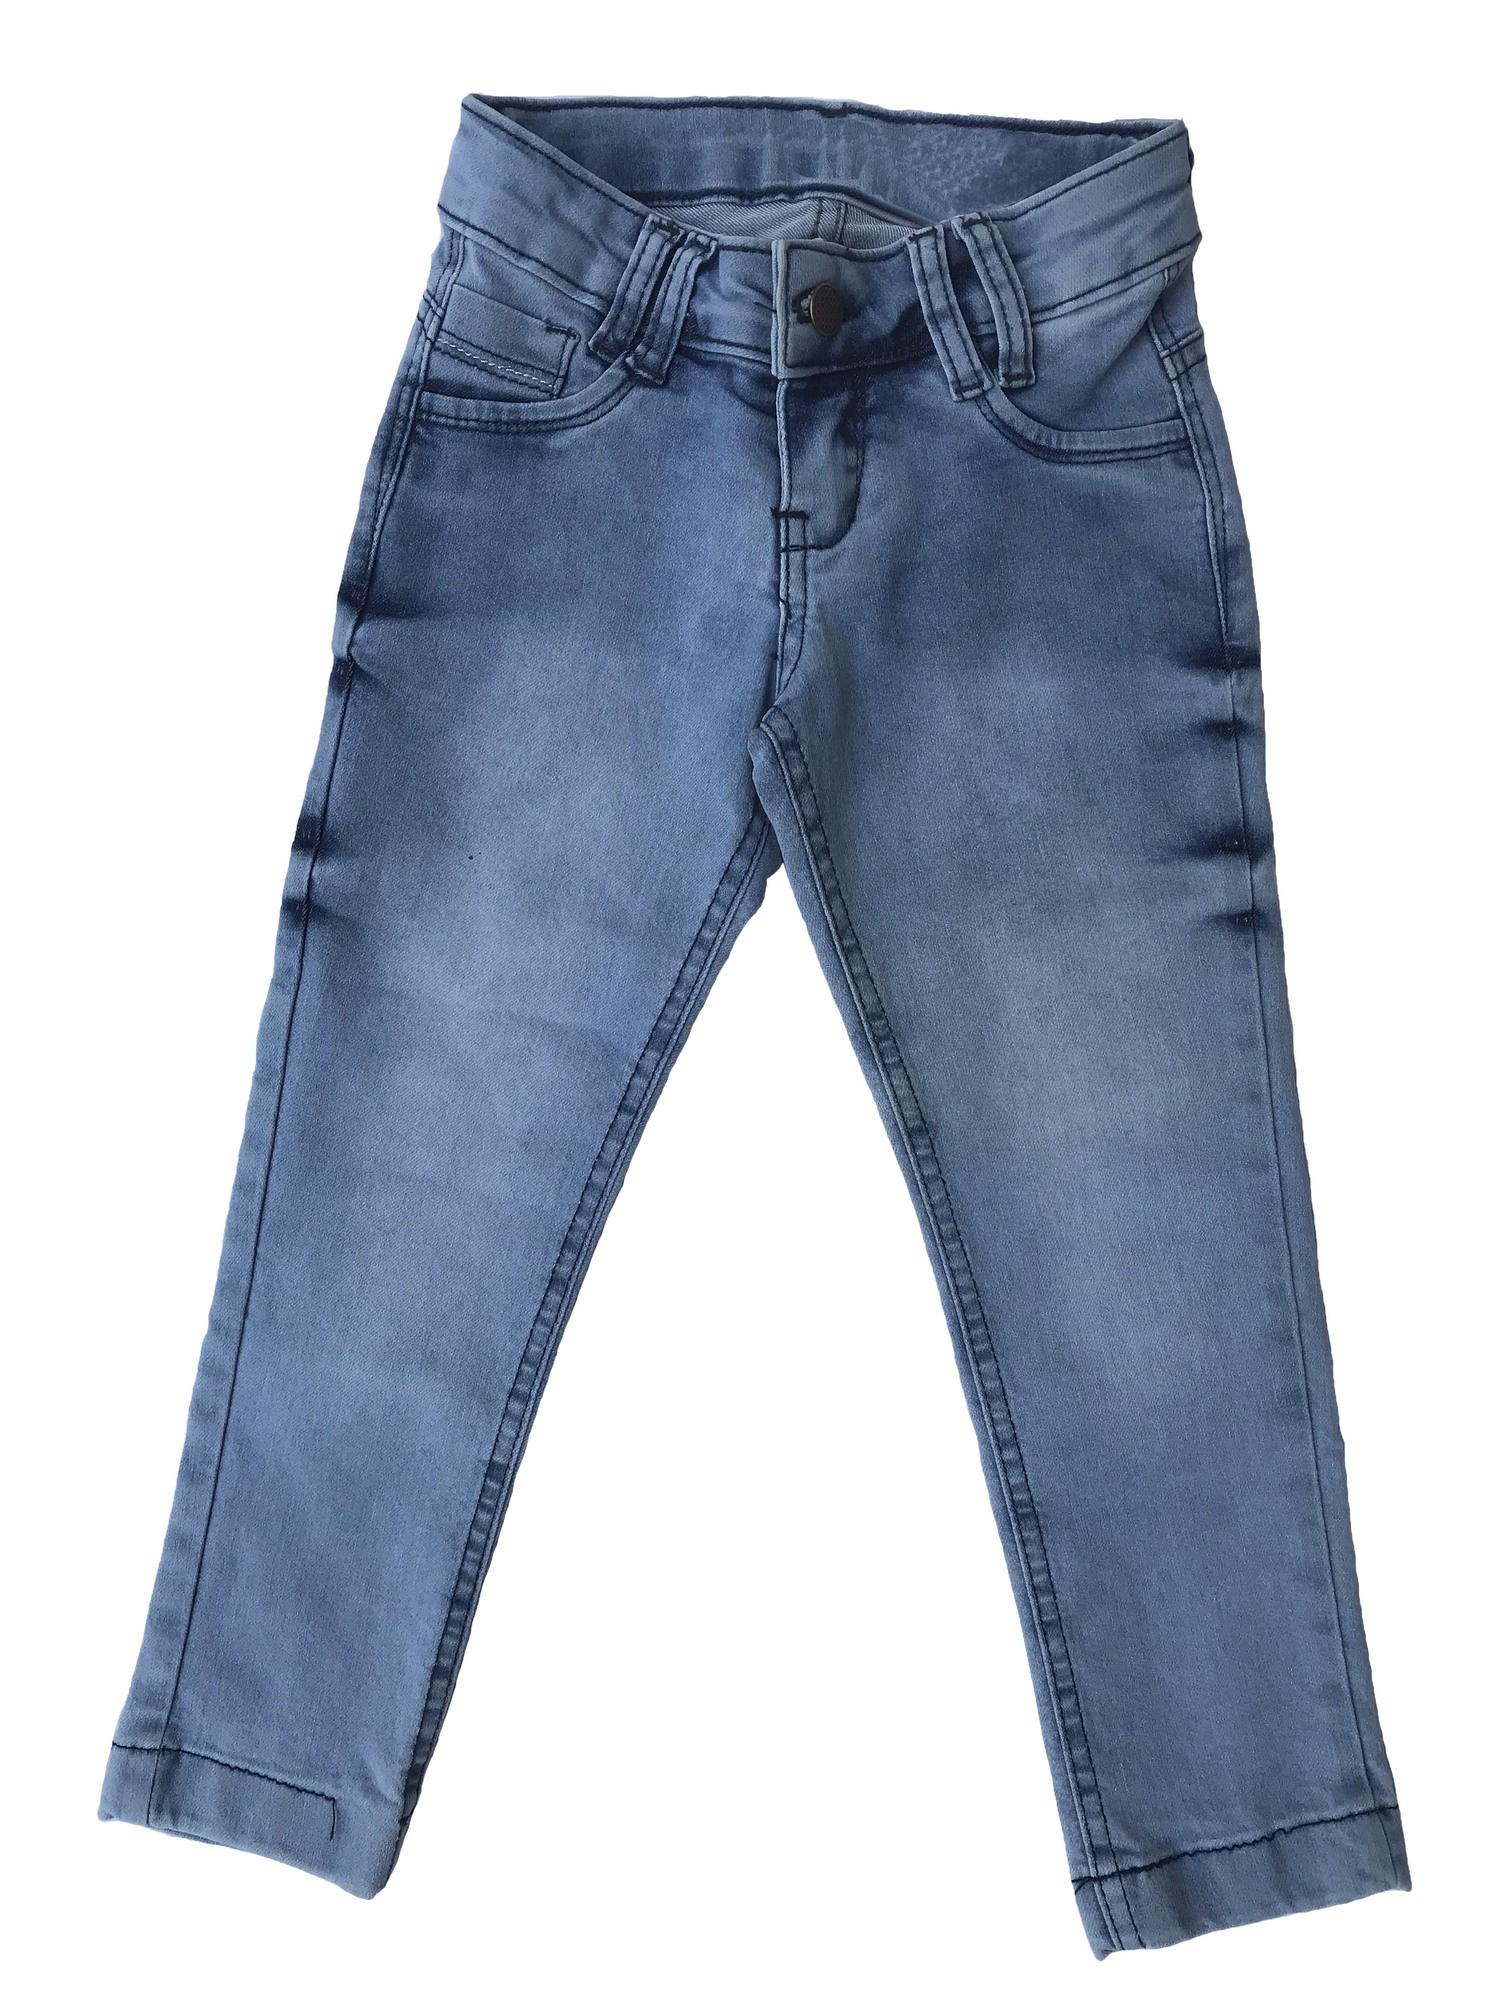 Calça Jeans Feminina Infantil [TV002]